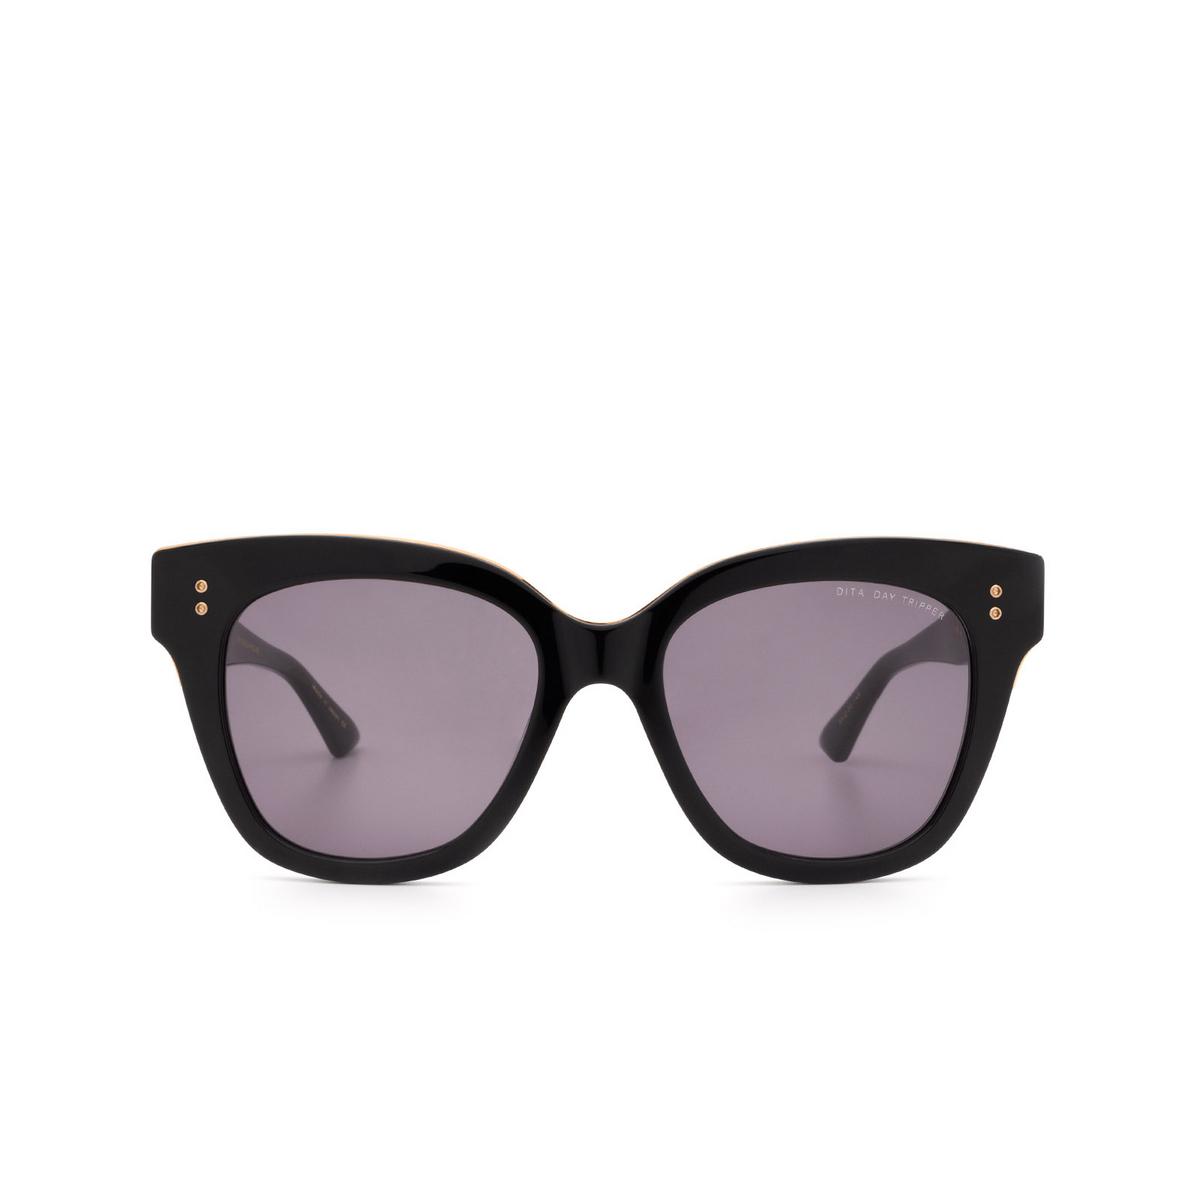 Dita® Butterfly Sunglasses: Day Tripper 22031-E color Black / Rose Gold Blk-rgd.